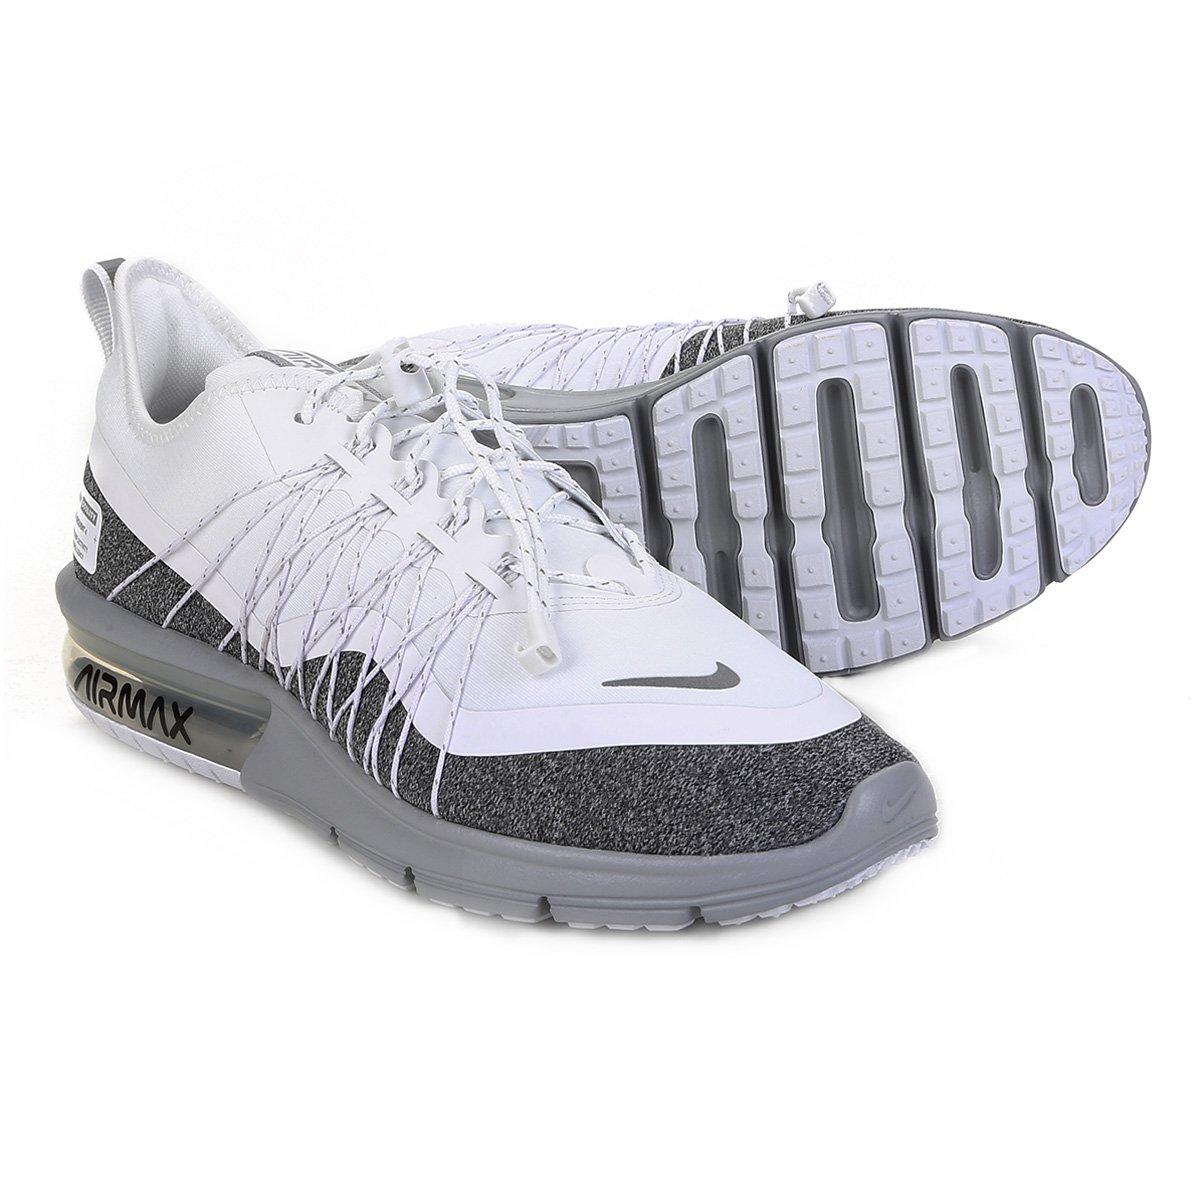 Tênis Nike Air Max Sequent 4 Utility Feminino - Tam: 34